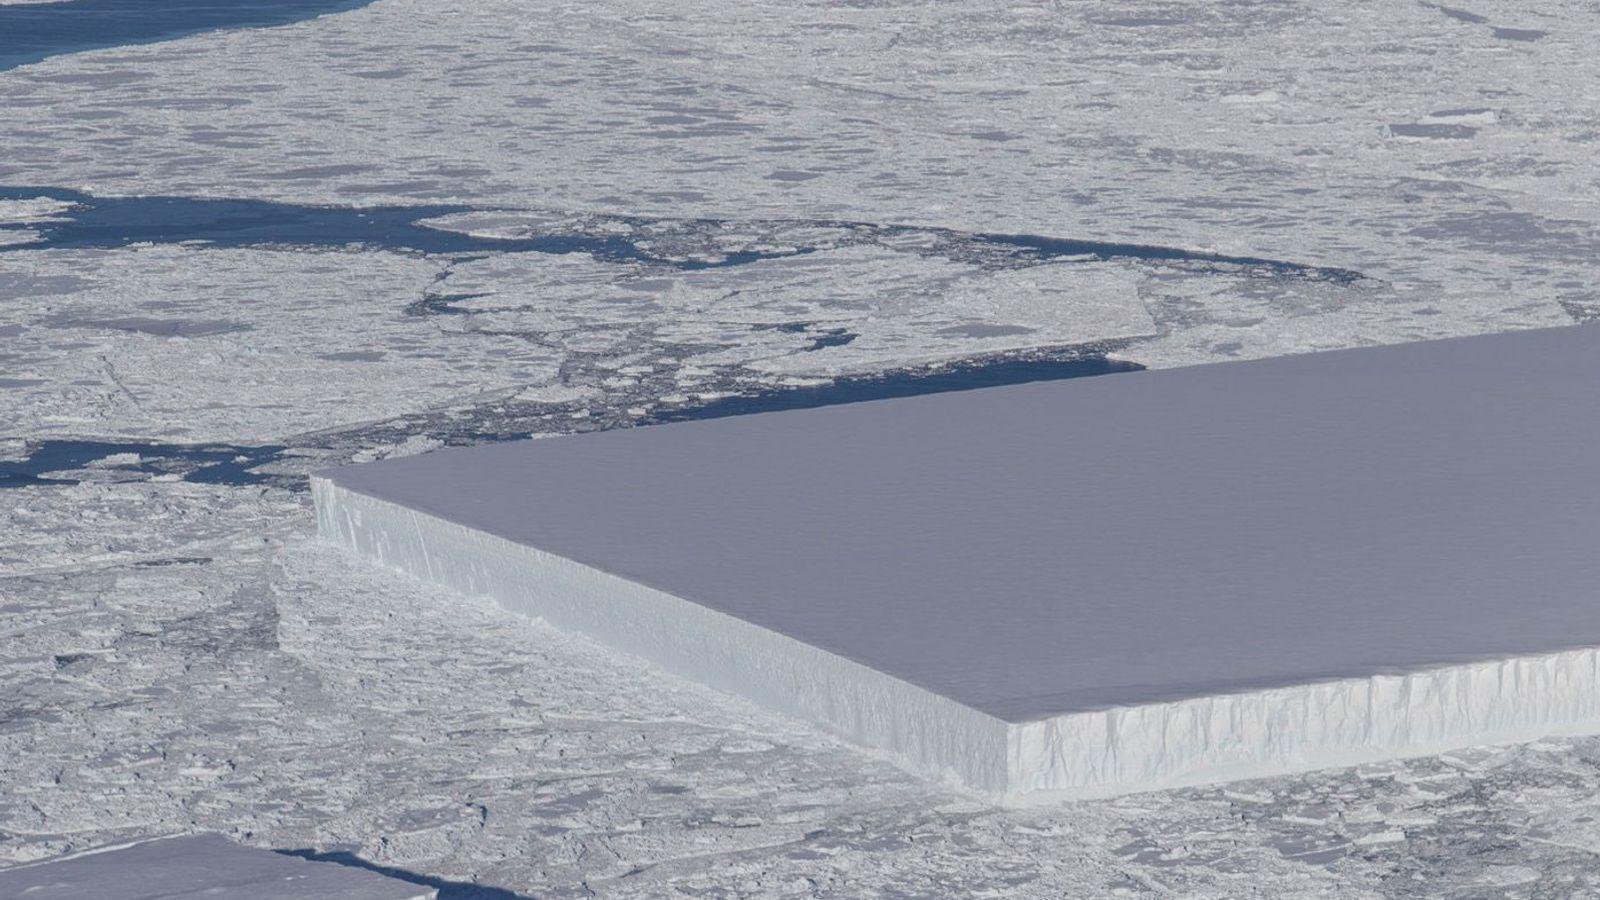 Ice Bridge flight: a tabular iceberg can be seen on the right, floating among sea ice ...